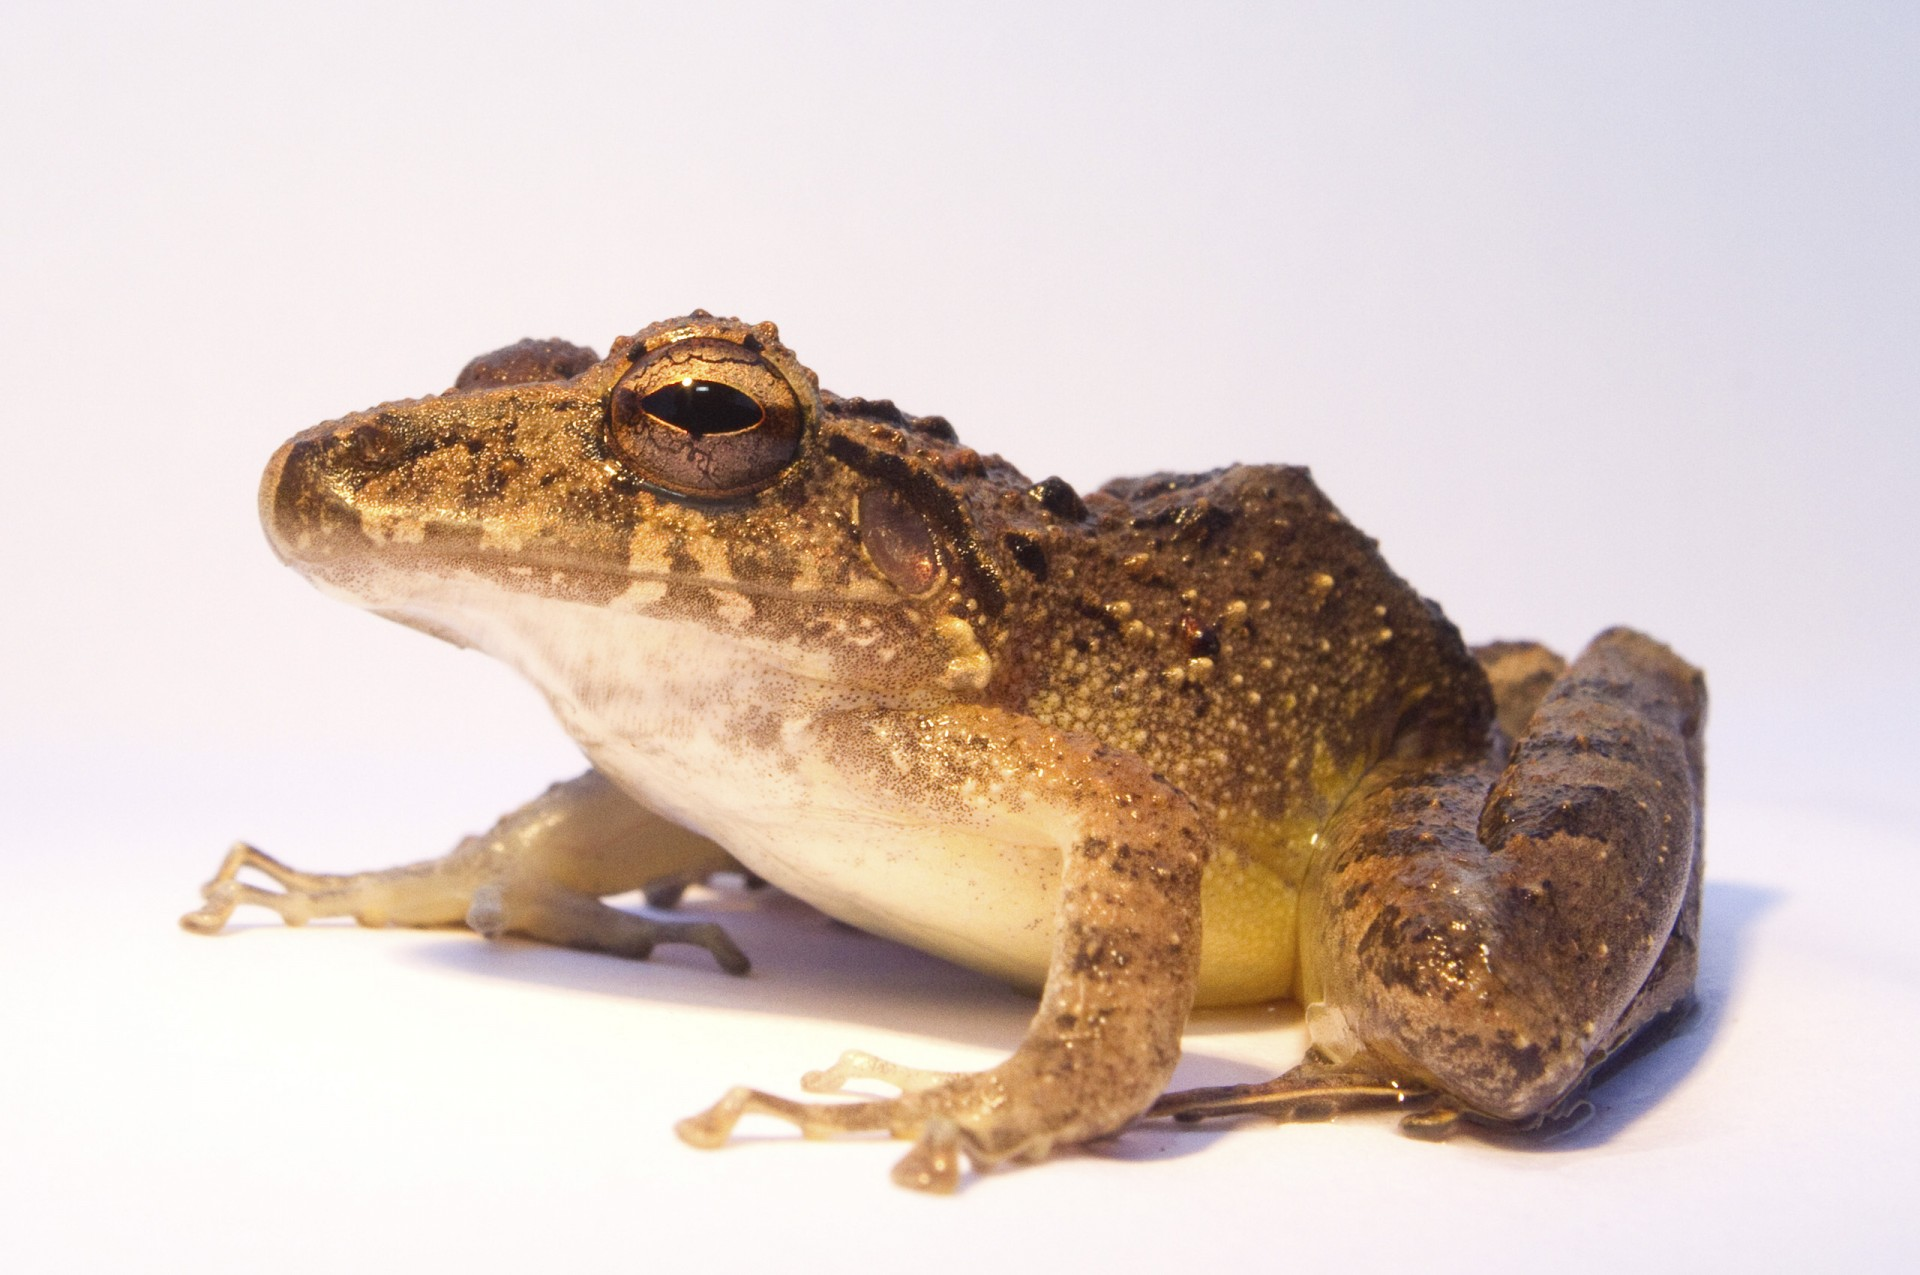 Amphibian pharmaceuticals